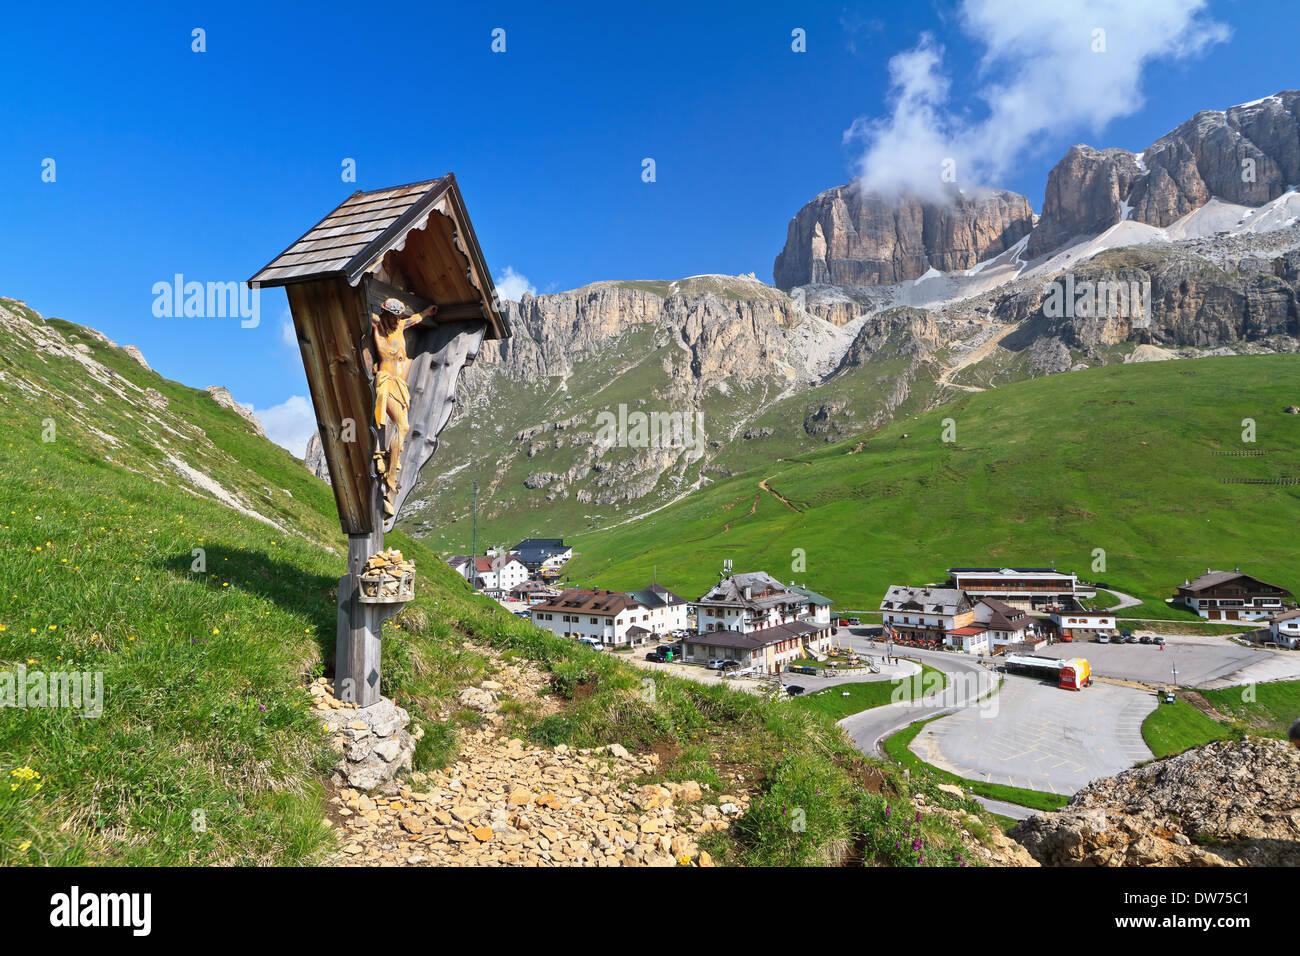 summer view of Pordoi pass, Italian Dolomites - Stock Image